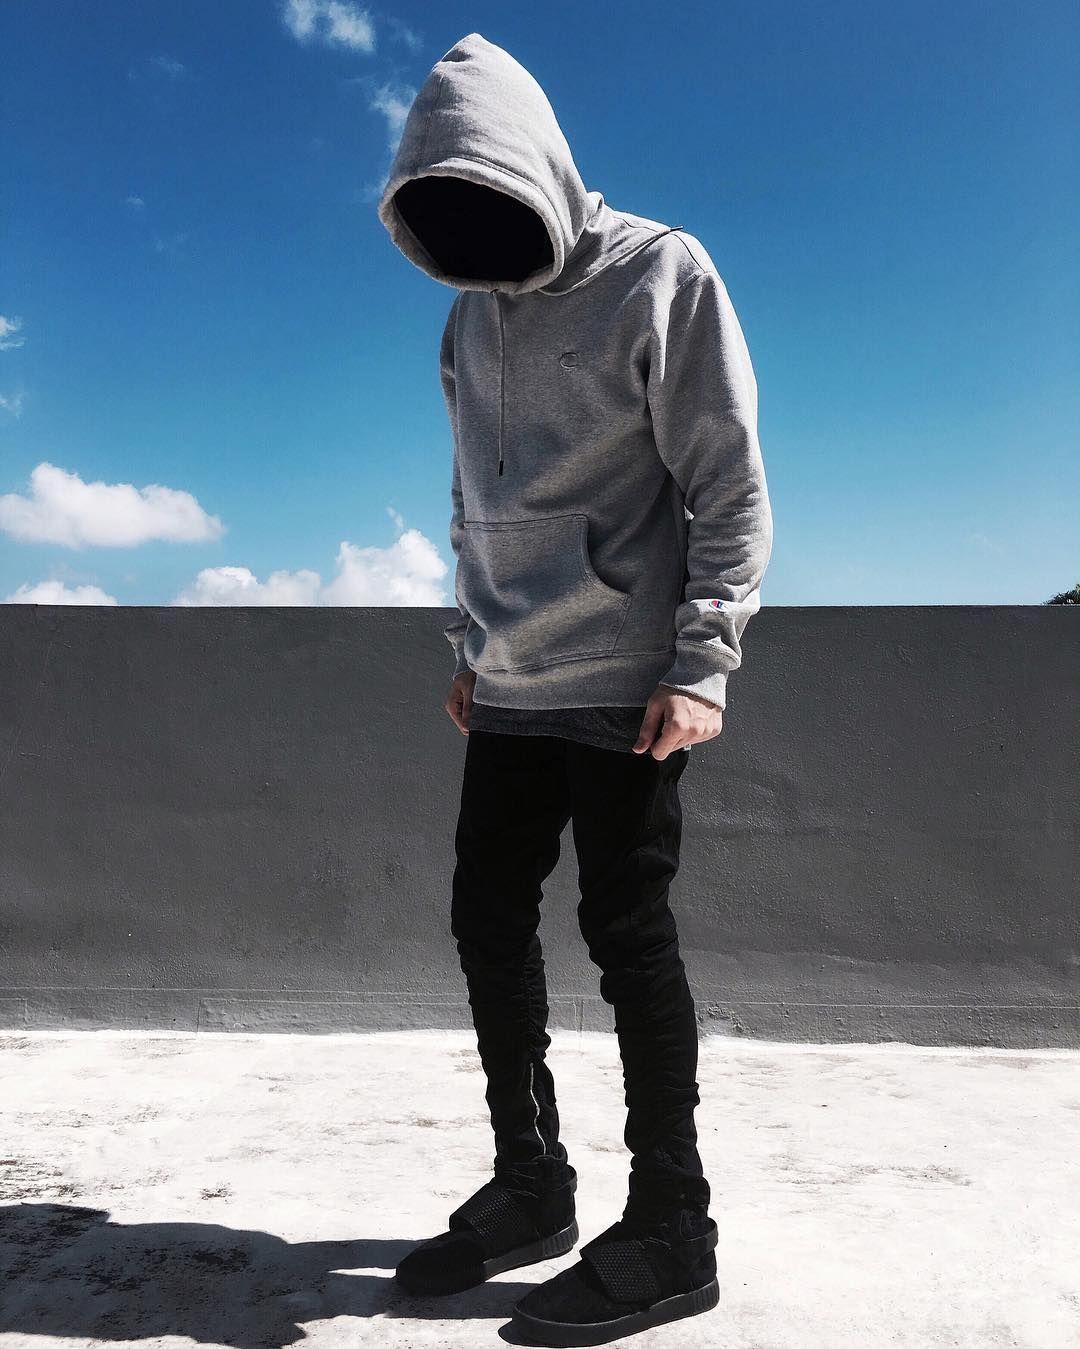 Wavy Fit u2022 Instagram @edriancortes - - #streetwear #streetstyle #champion #hoodie #gray #blvck ...